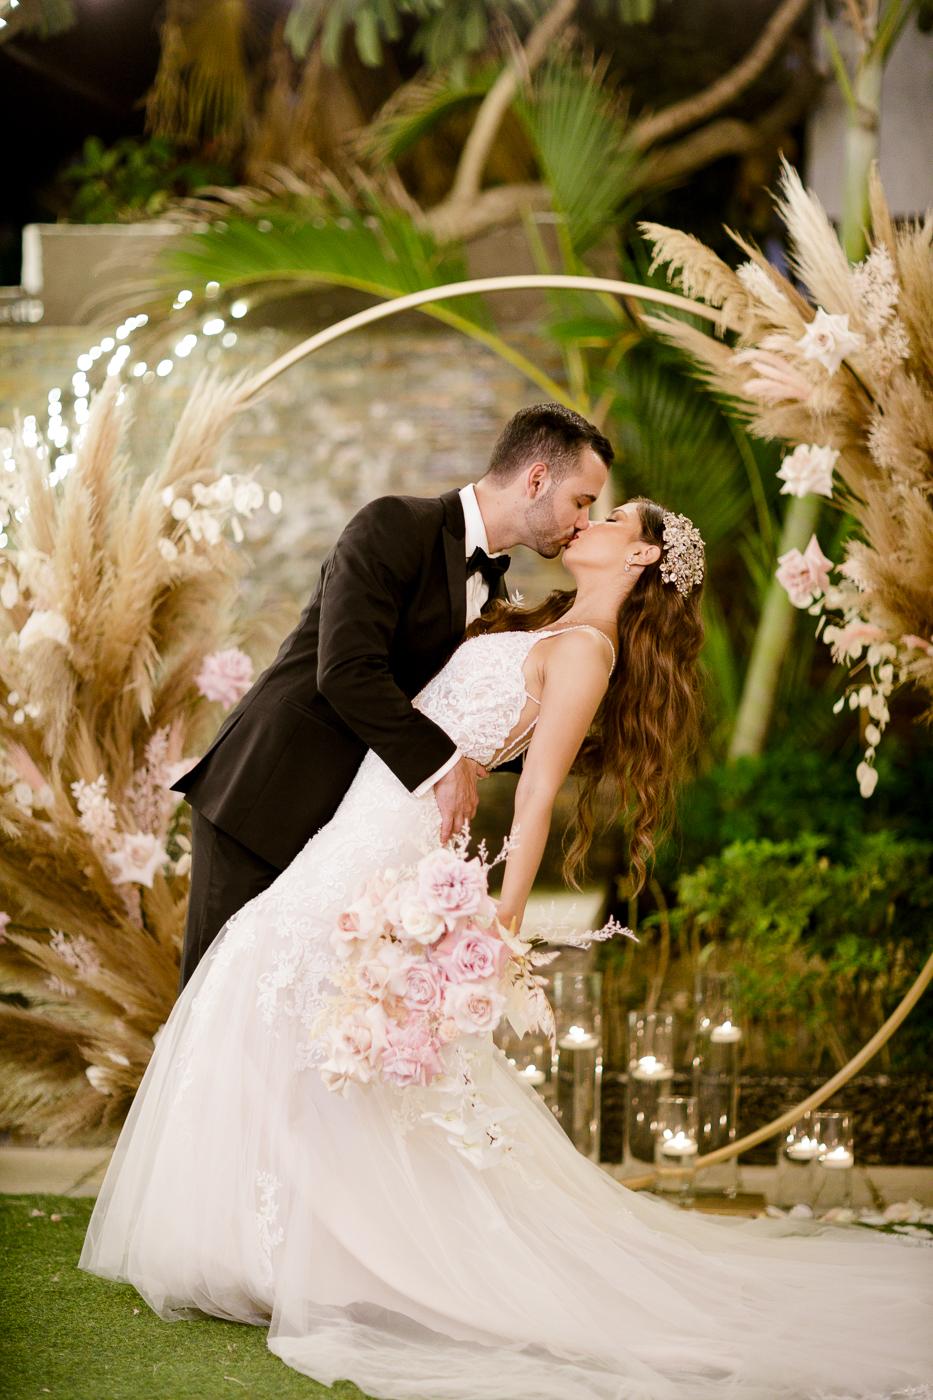 Karen & Caio – formal (5 of 5)